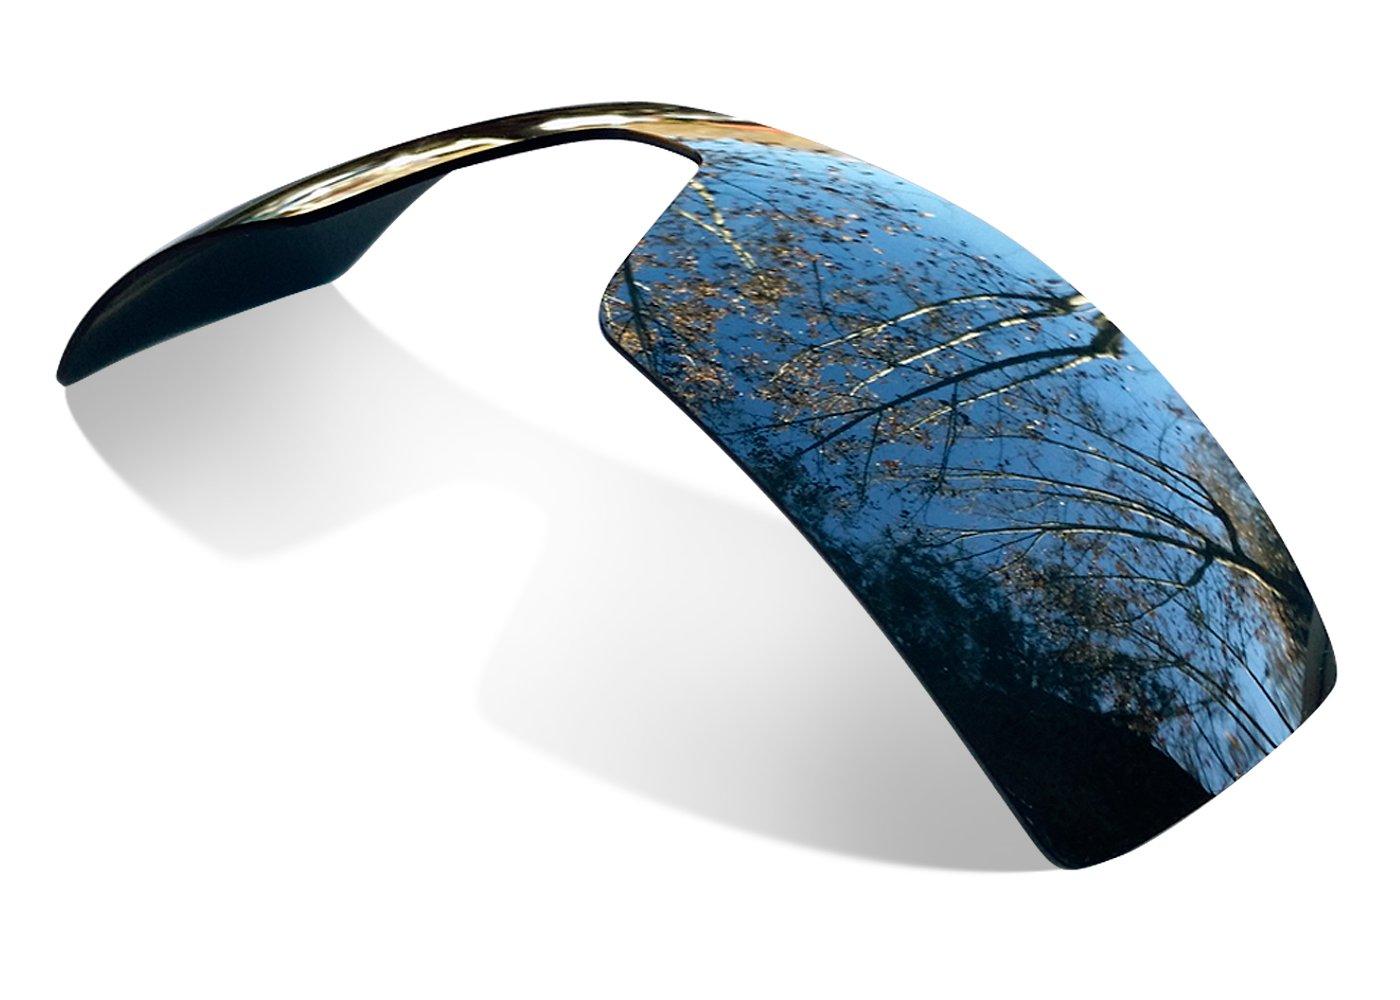 Sunglasses Restorer Lentes Polarizadas de Recambio Black Iridium para Oakley Oil Rig